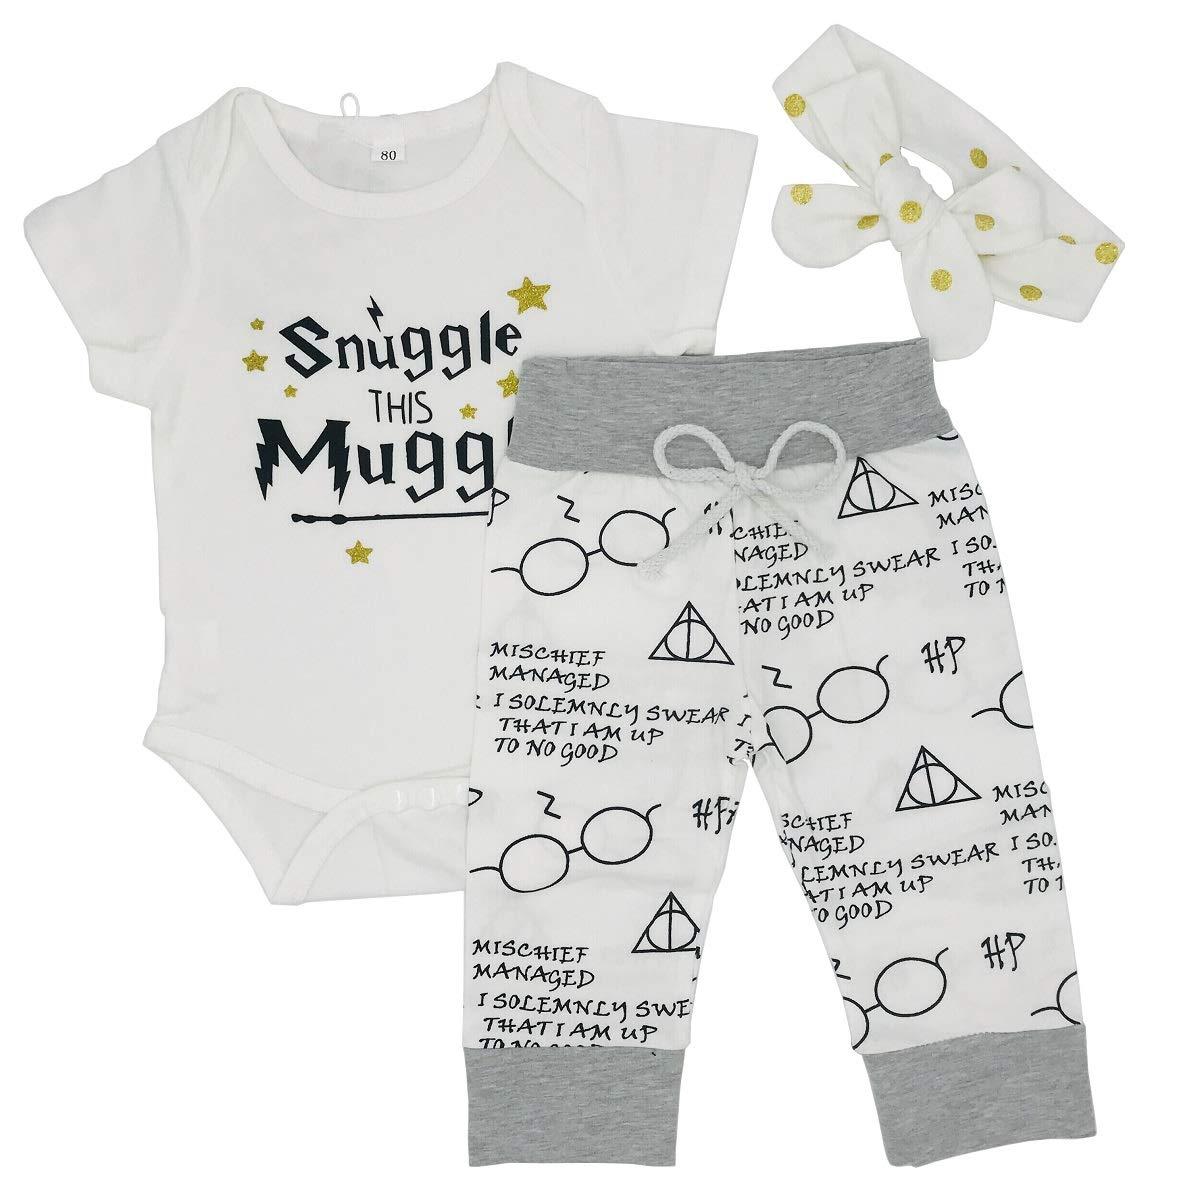 d9bfaf5e MOLYHUA Toddler Girl's Boys Clothes, 3Pcs Infant Kids Snuggle This Mugg  Romper Shorts Headband Outfits Set